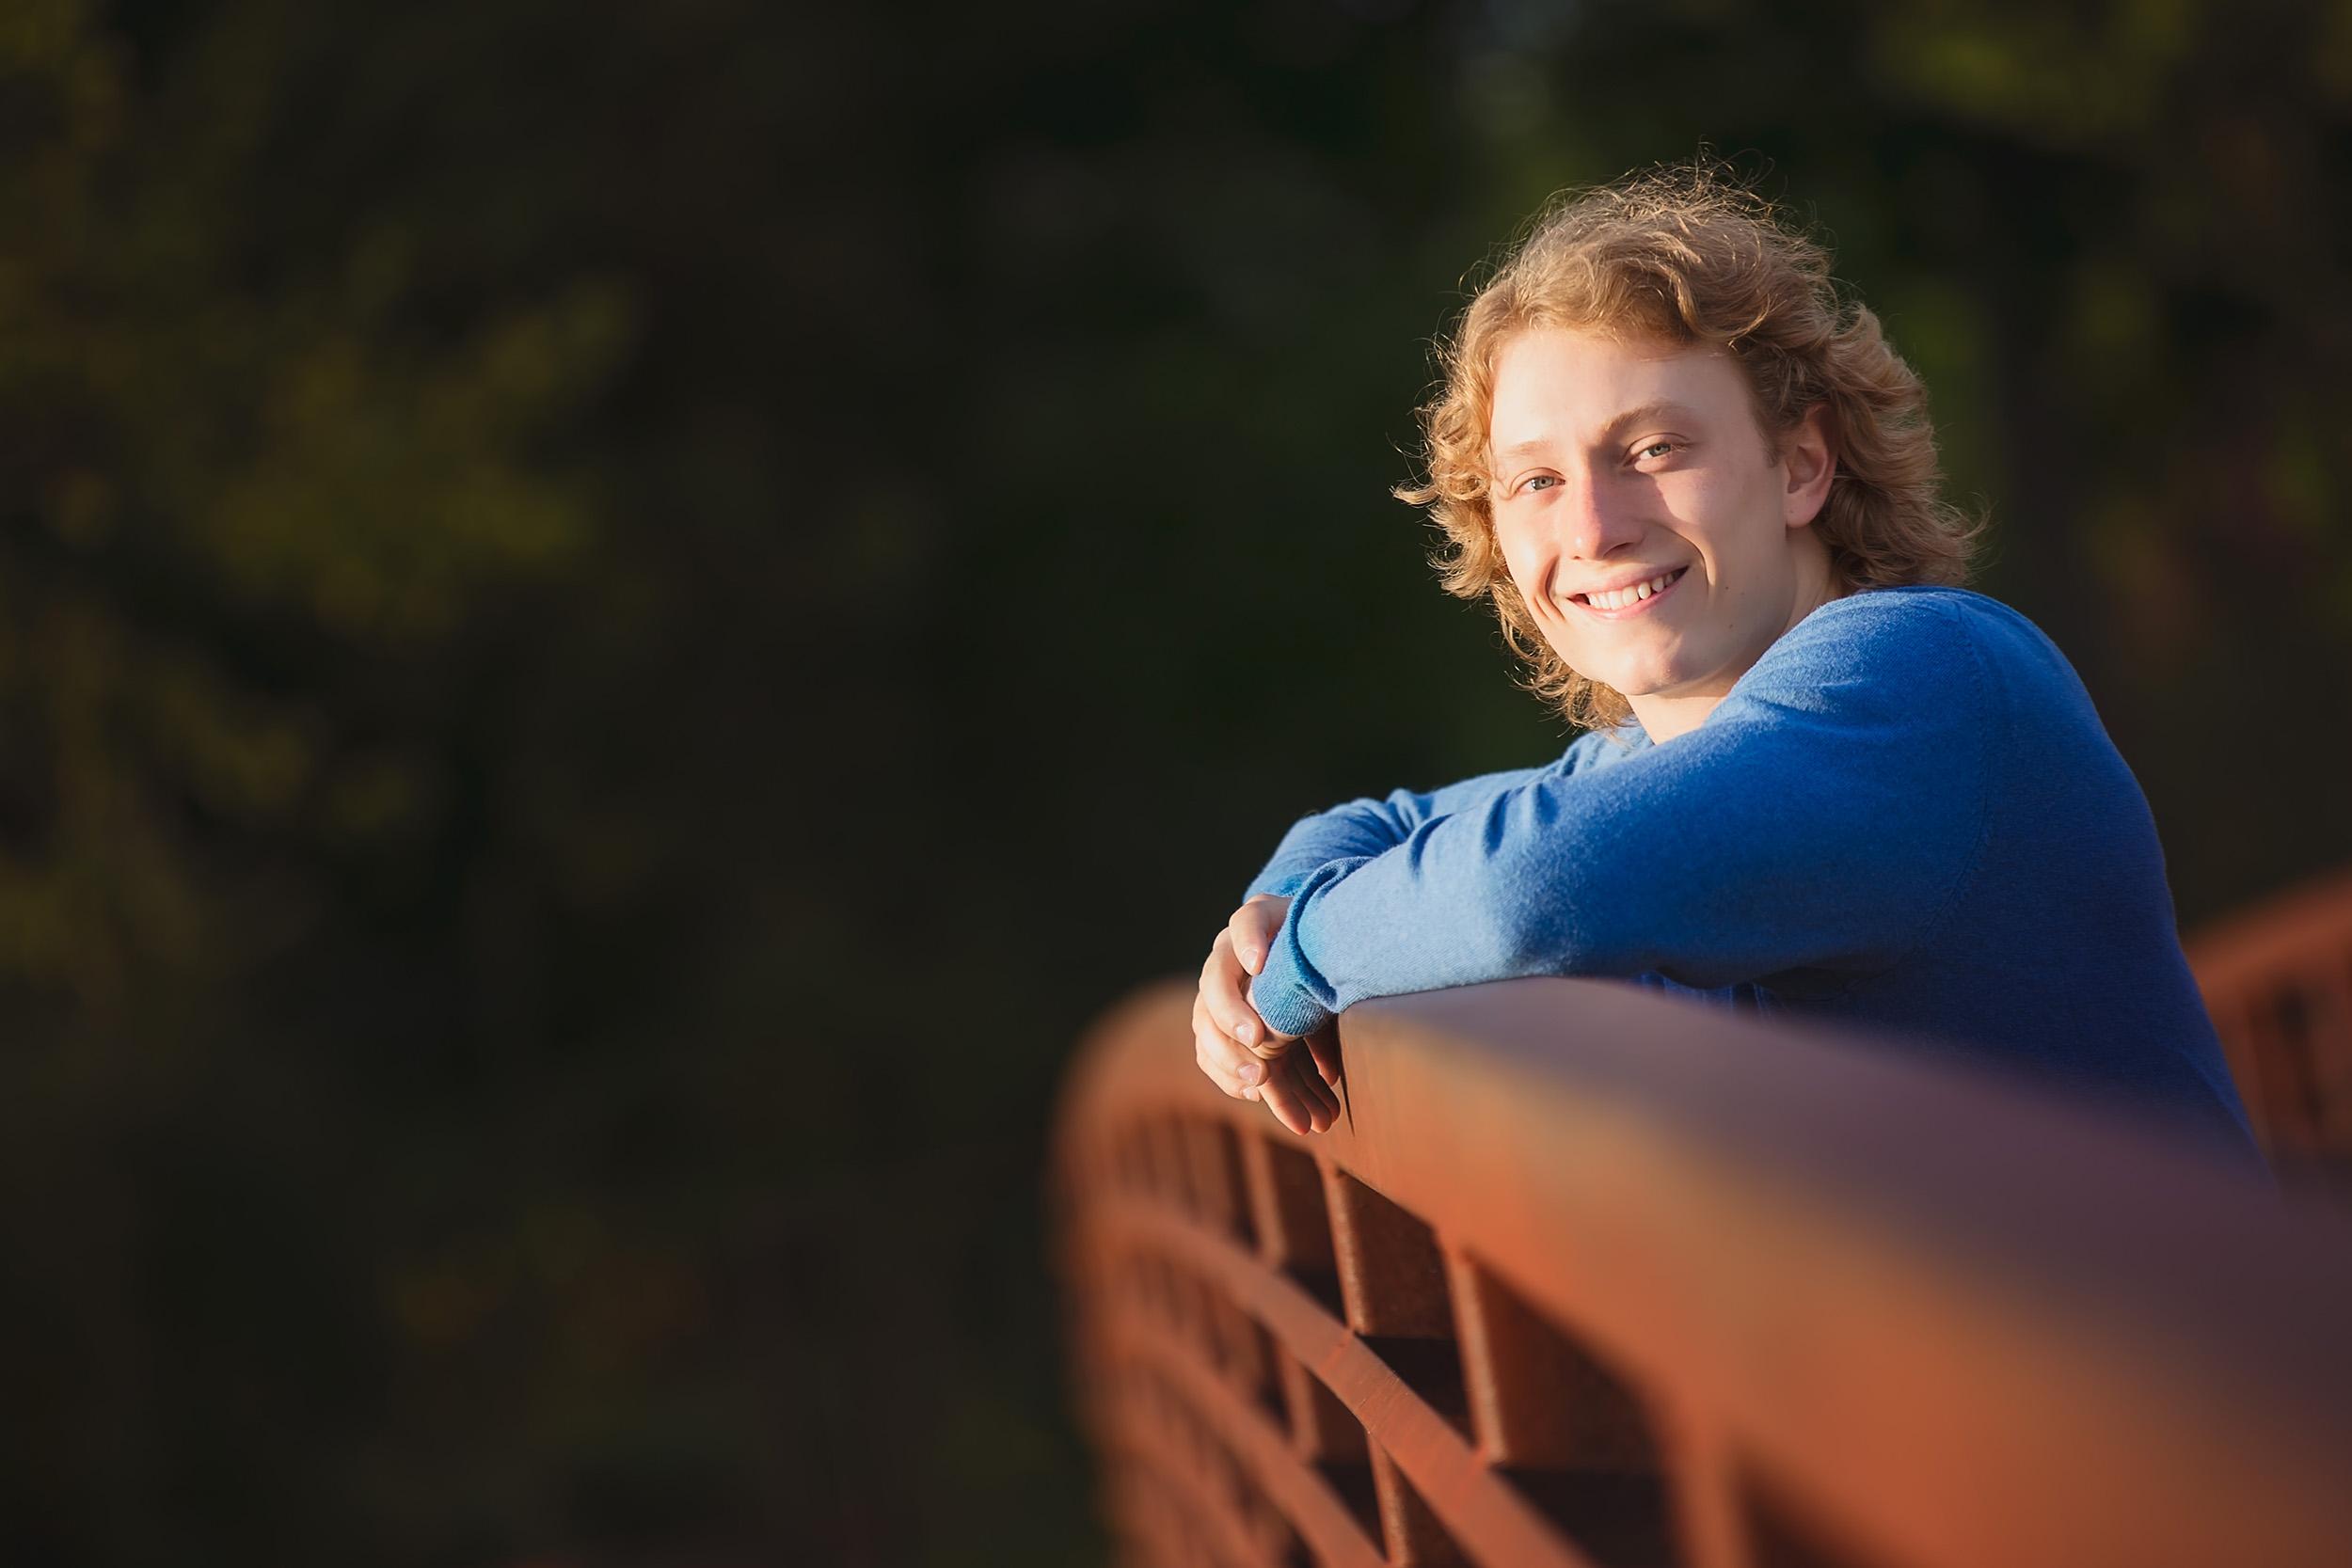 springfield-mo-senior-portrait-photography (35).jpg